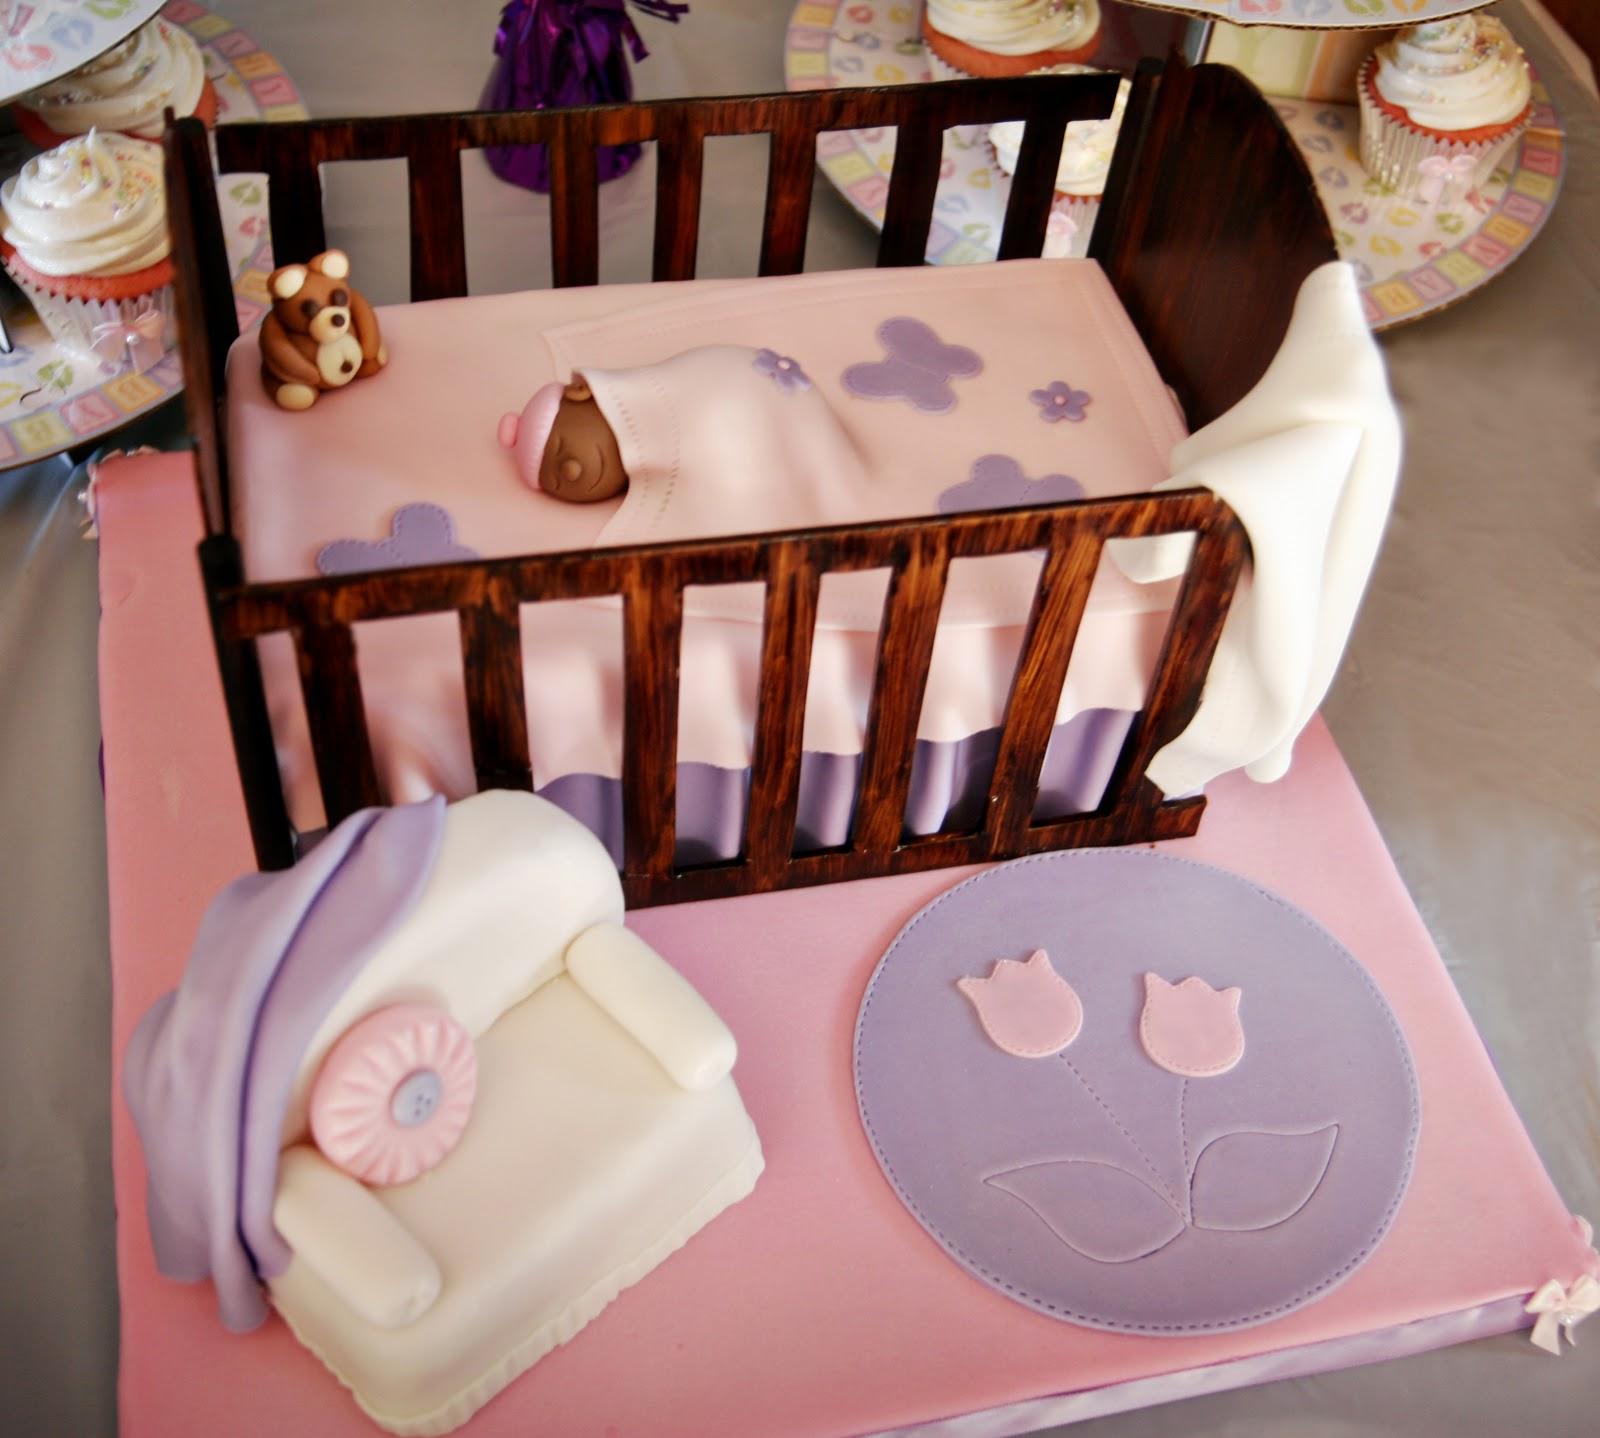 Baby cribs jacksonville fl - Baby Cribs Jacksonville Fl 47